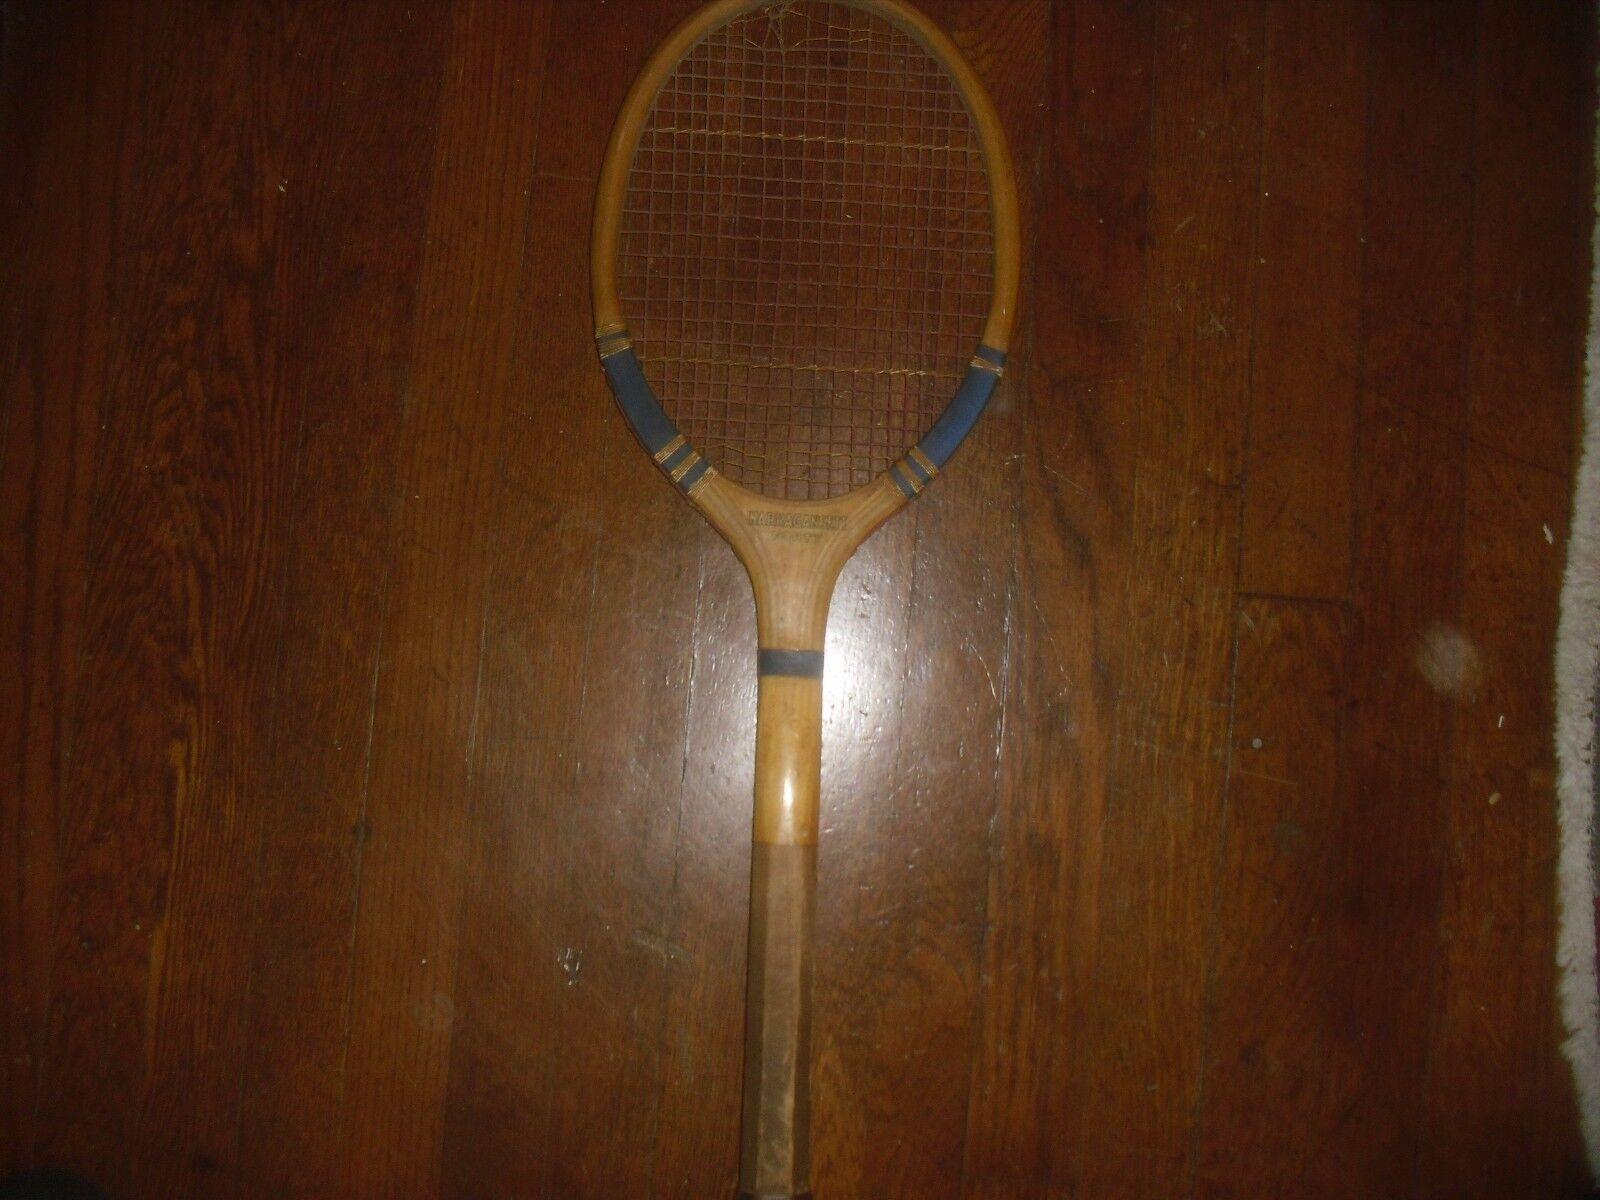 Narragansett quarante en Bois Raquette de tennis raquette 1929